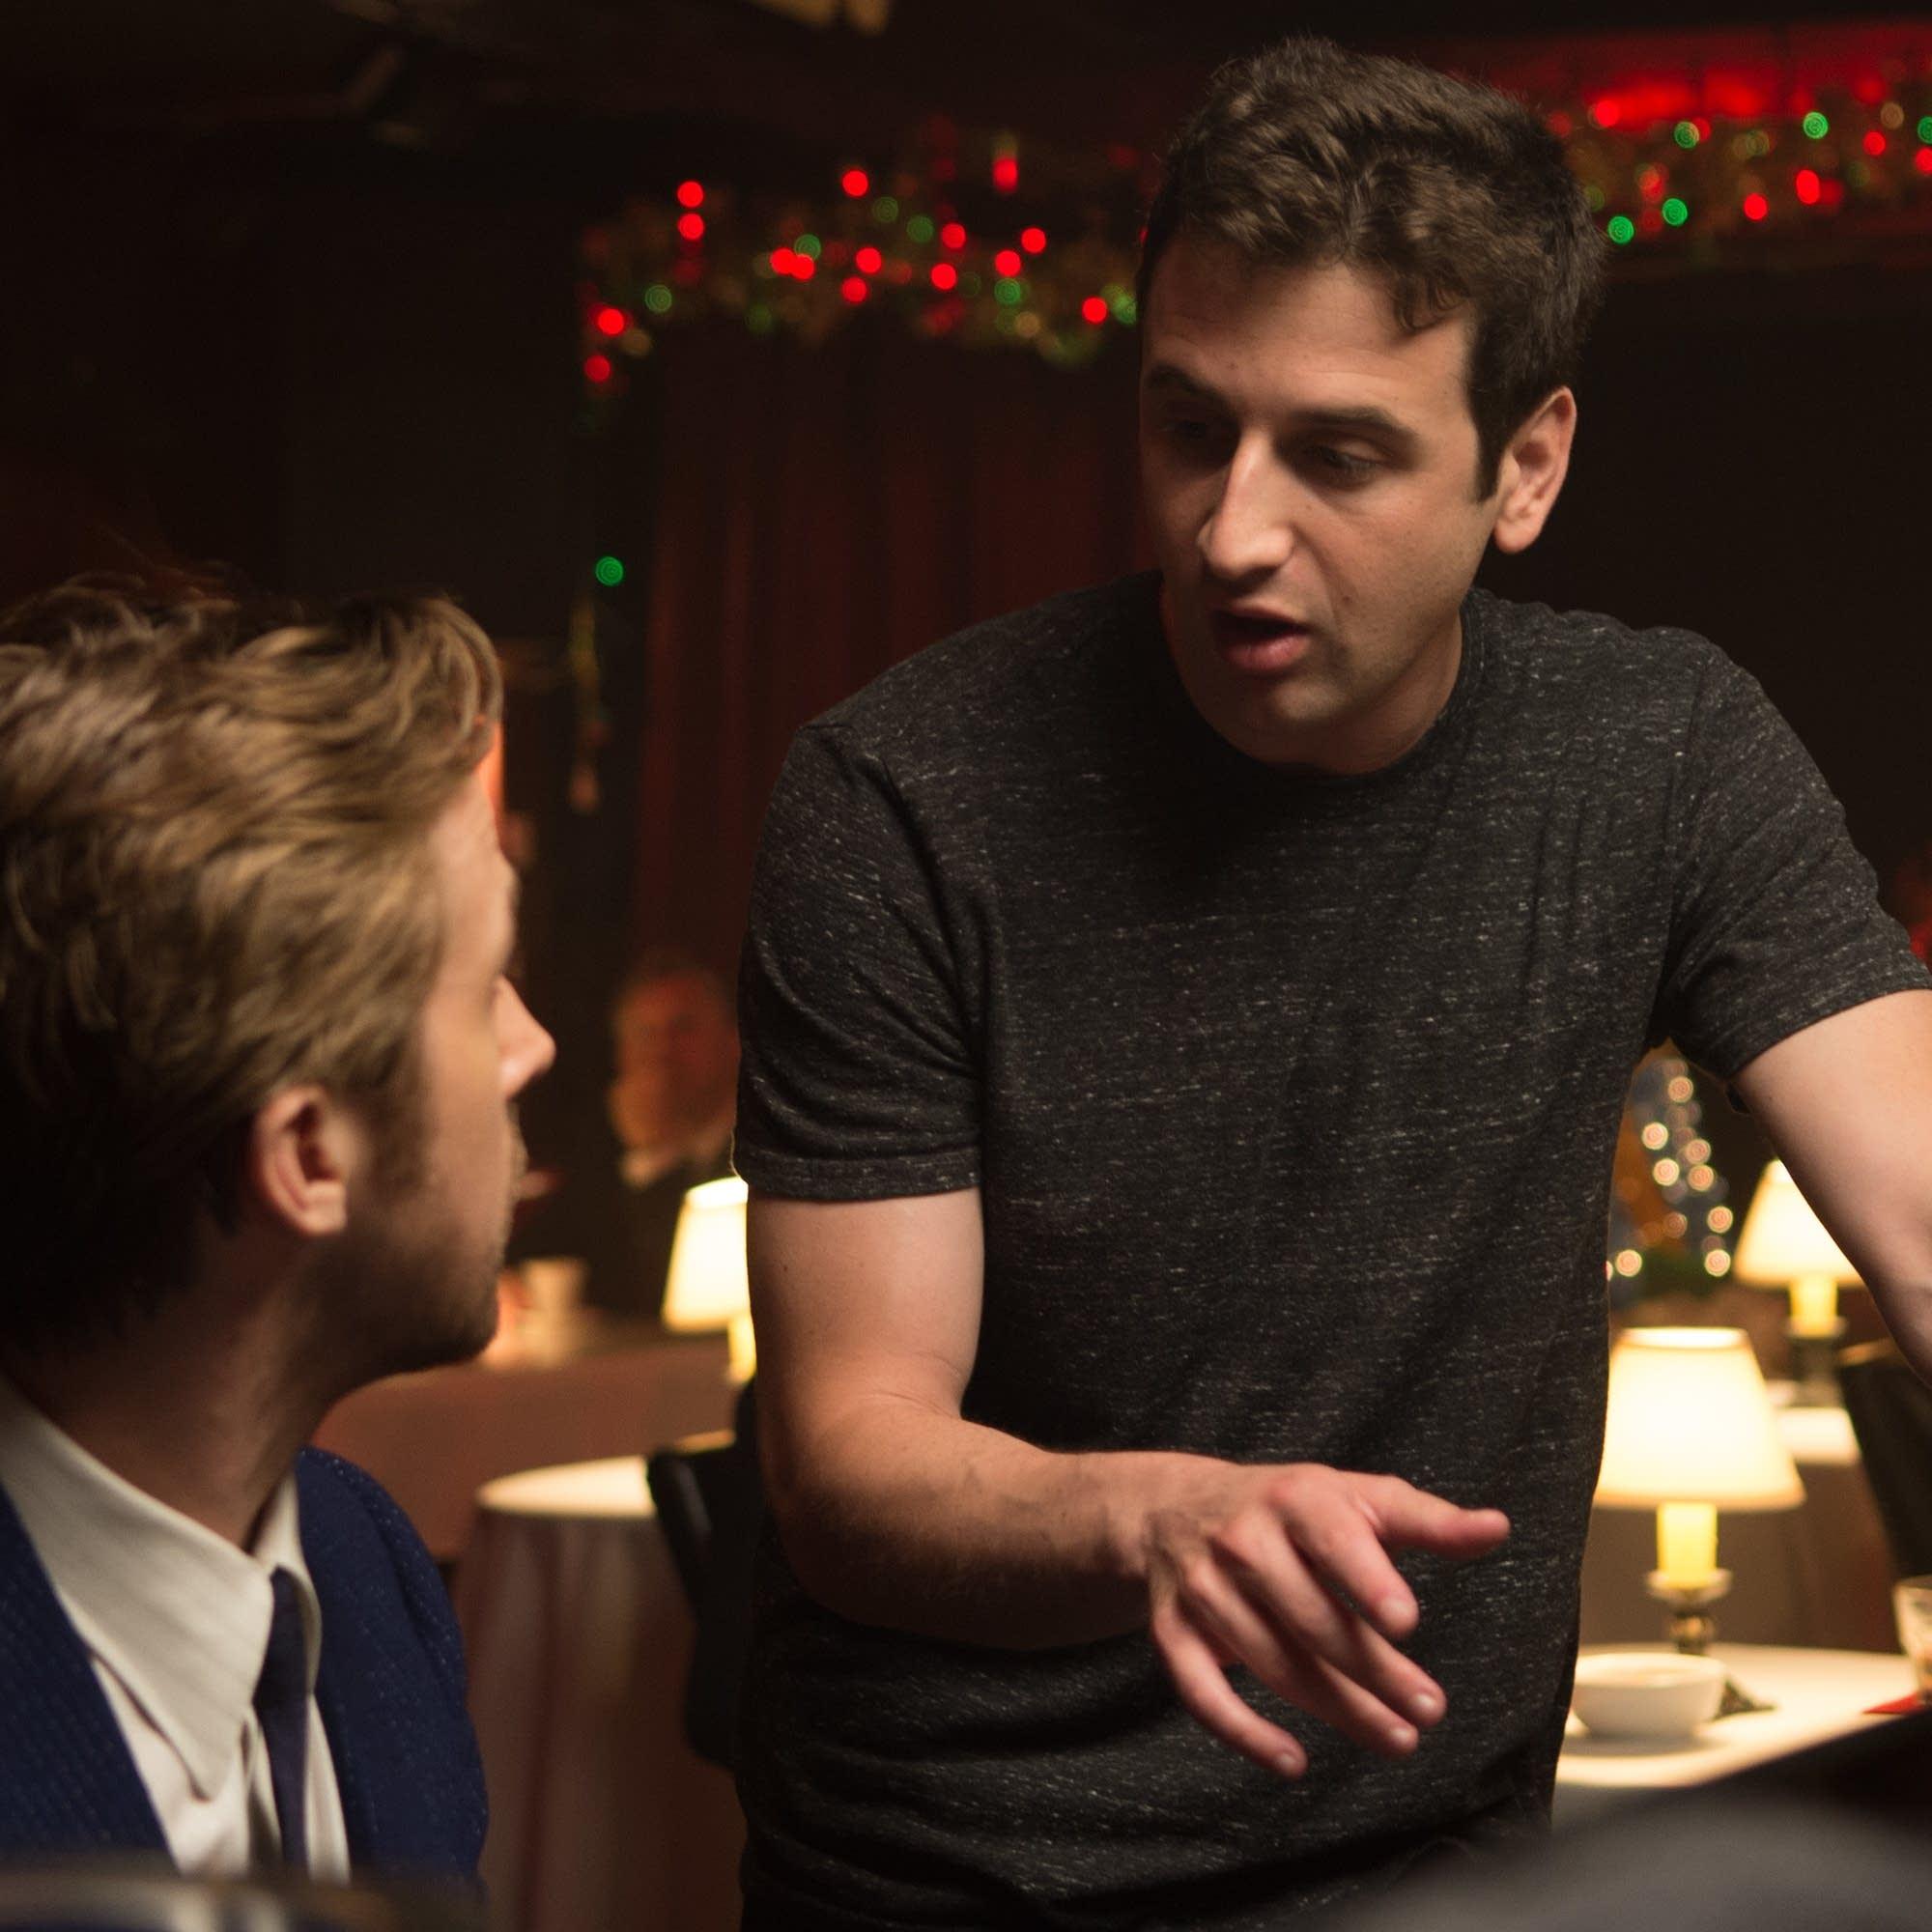 Ryan Gosling and Composer Justin Hurwitz on the set of 'La La Land.'